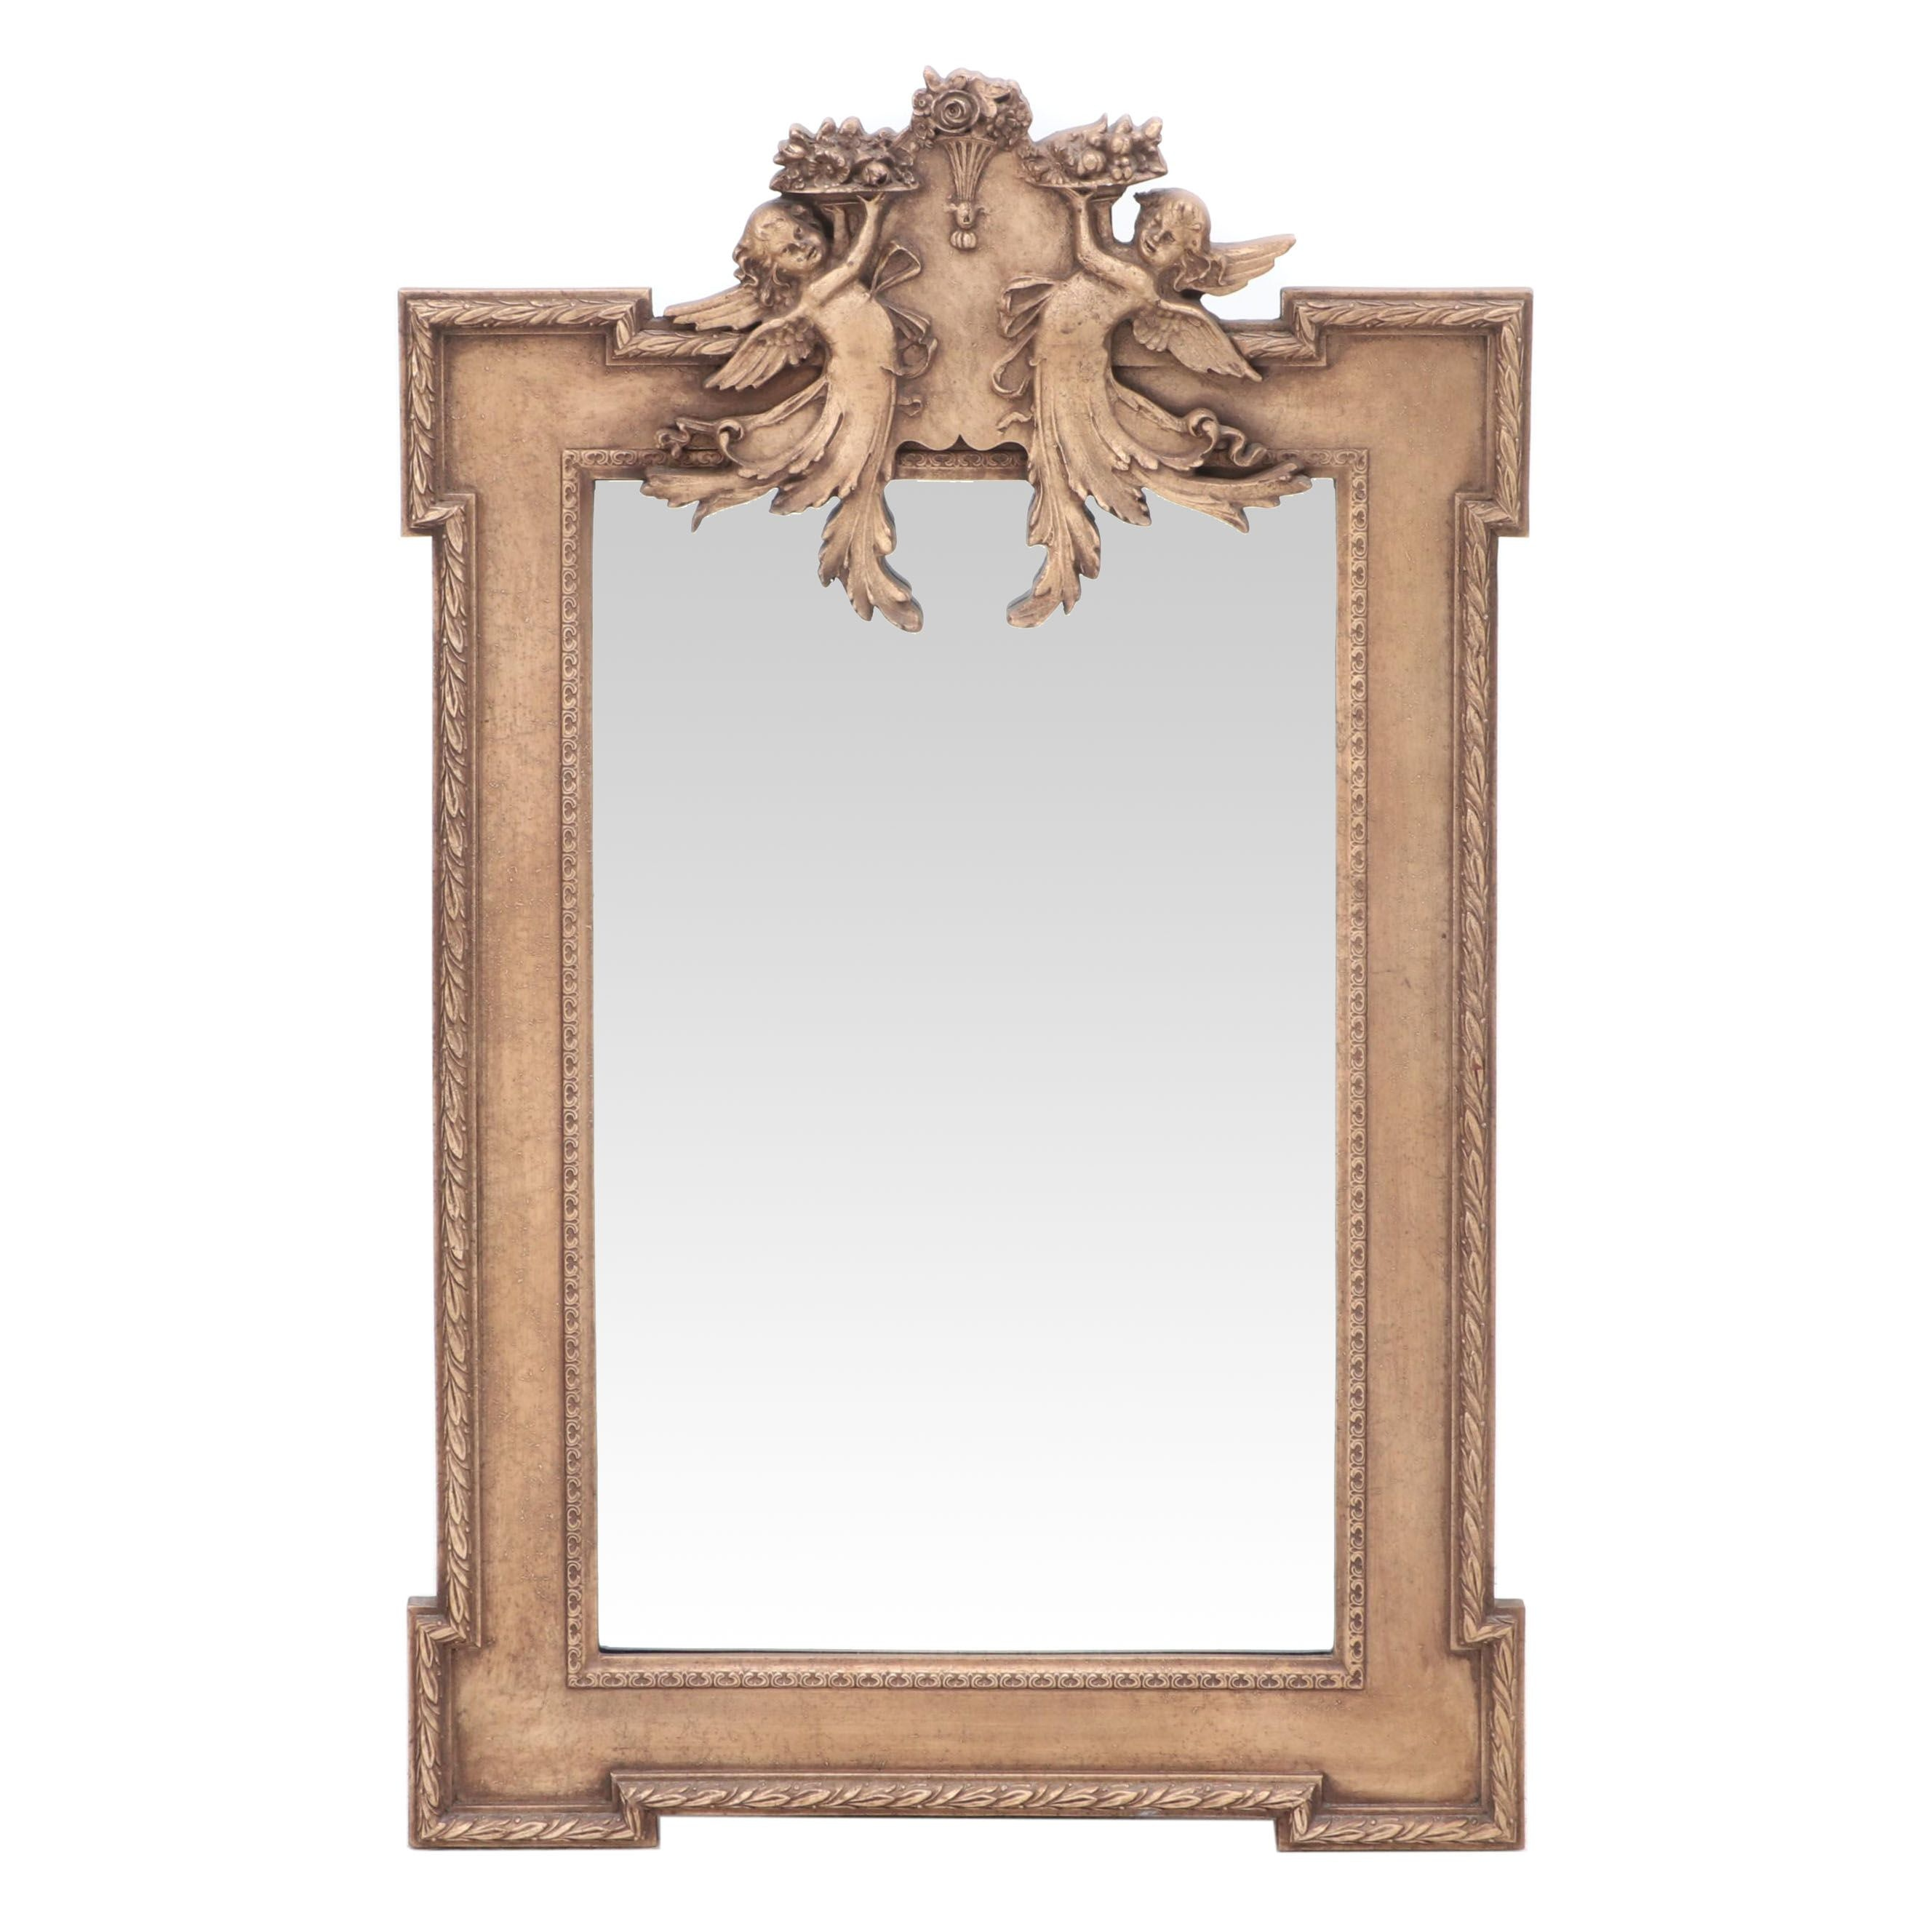 Giltwood Figural Cherub Wall Mirror, Late 20th Century